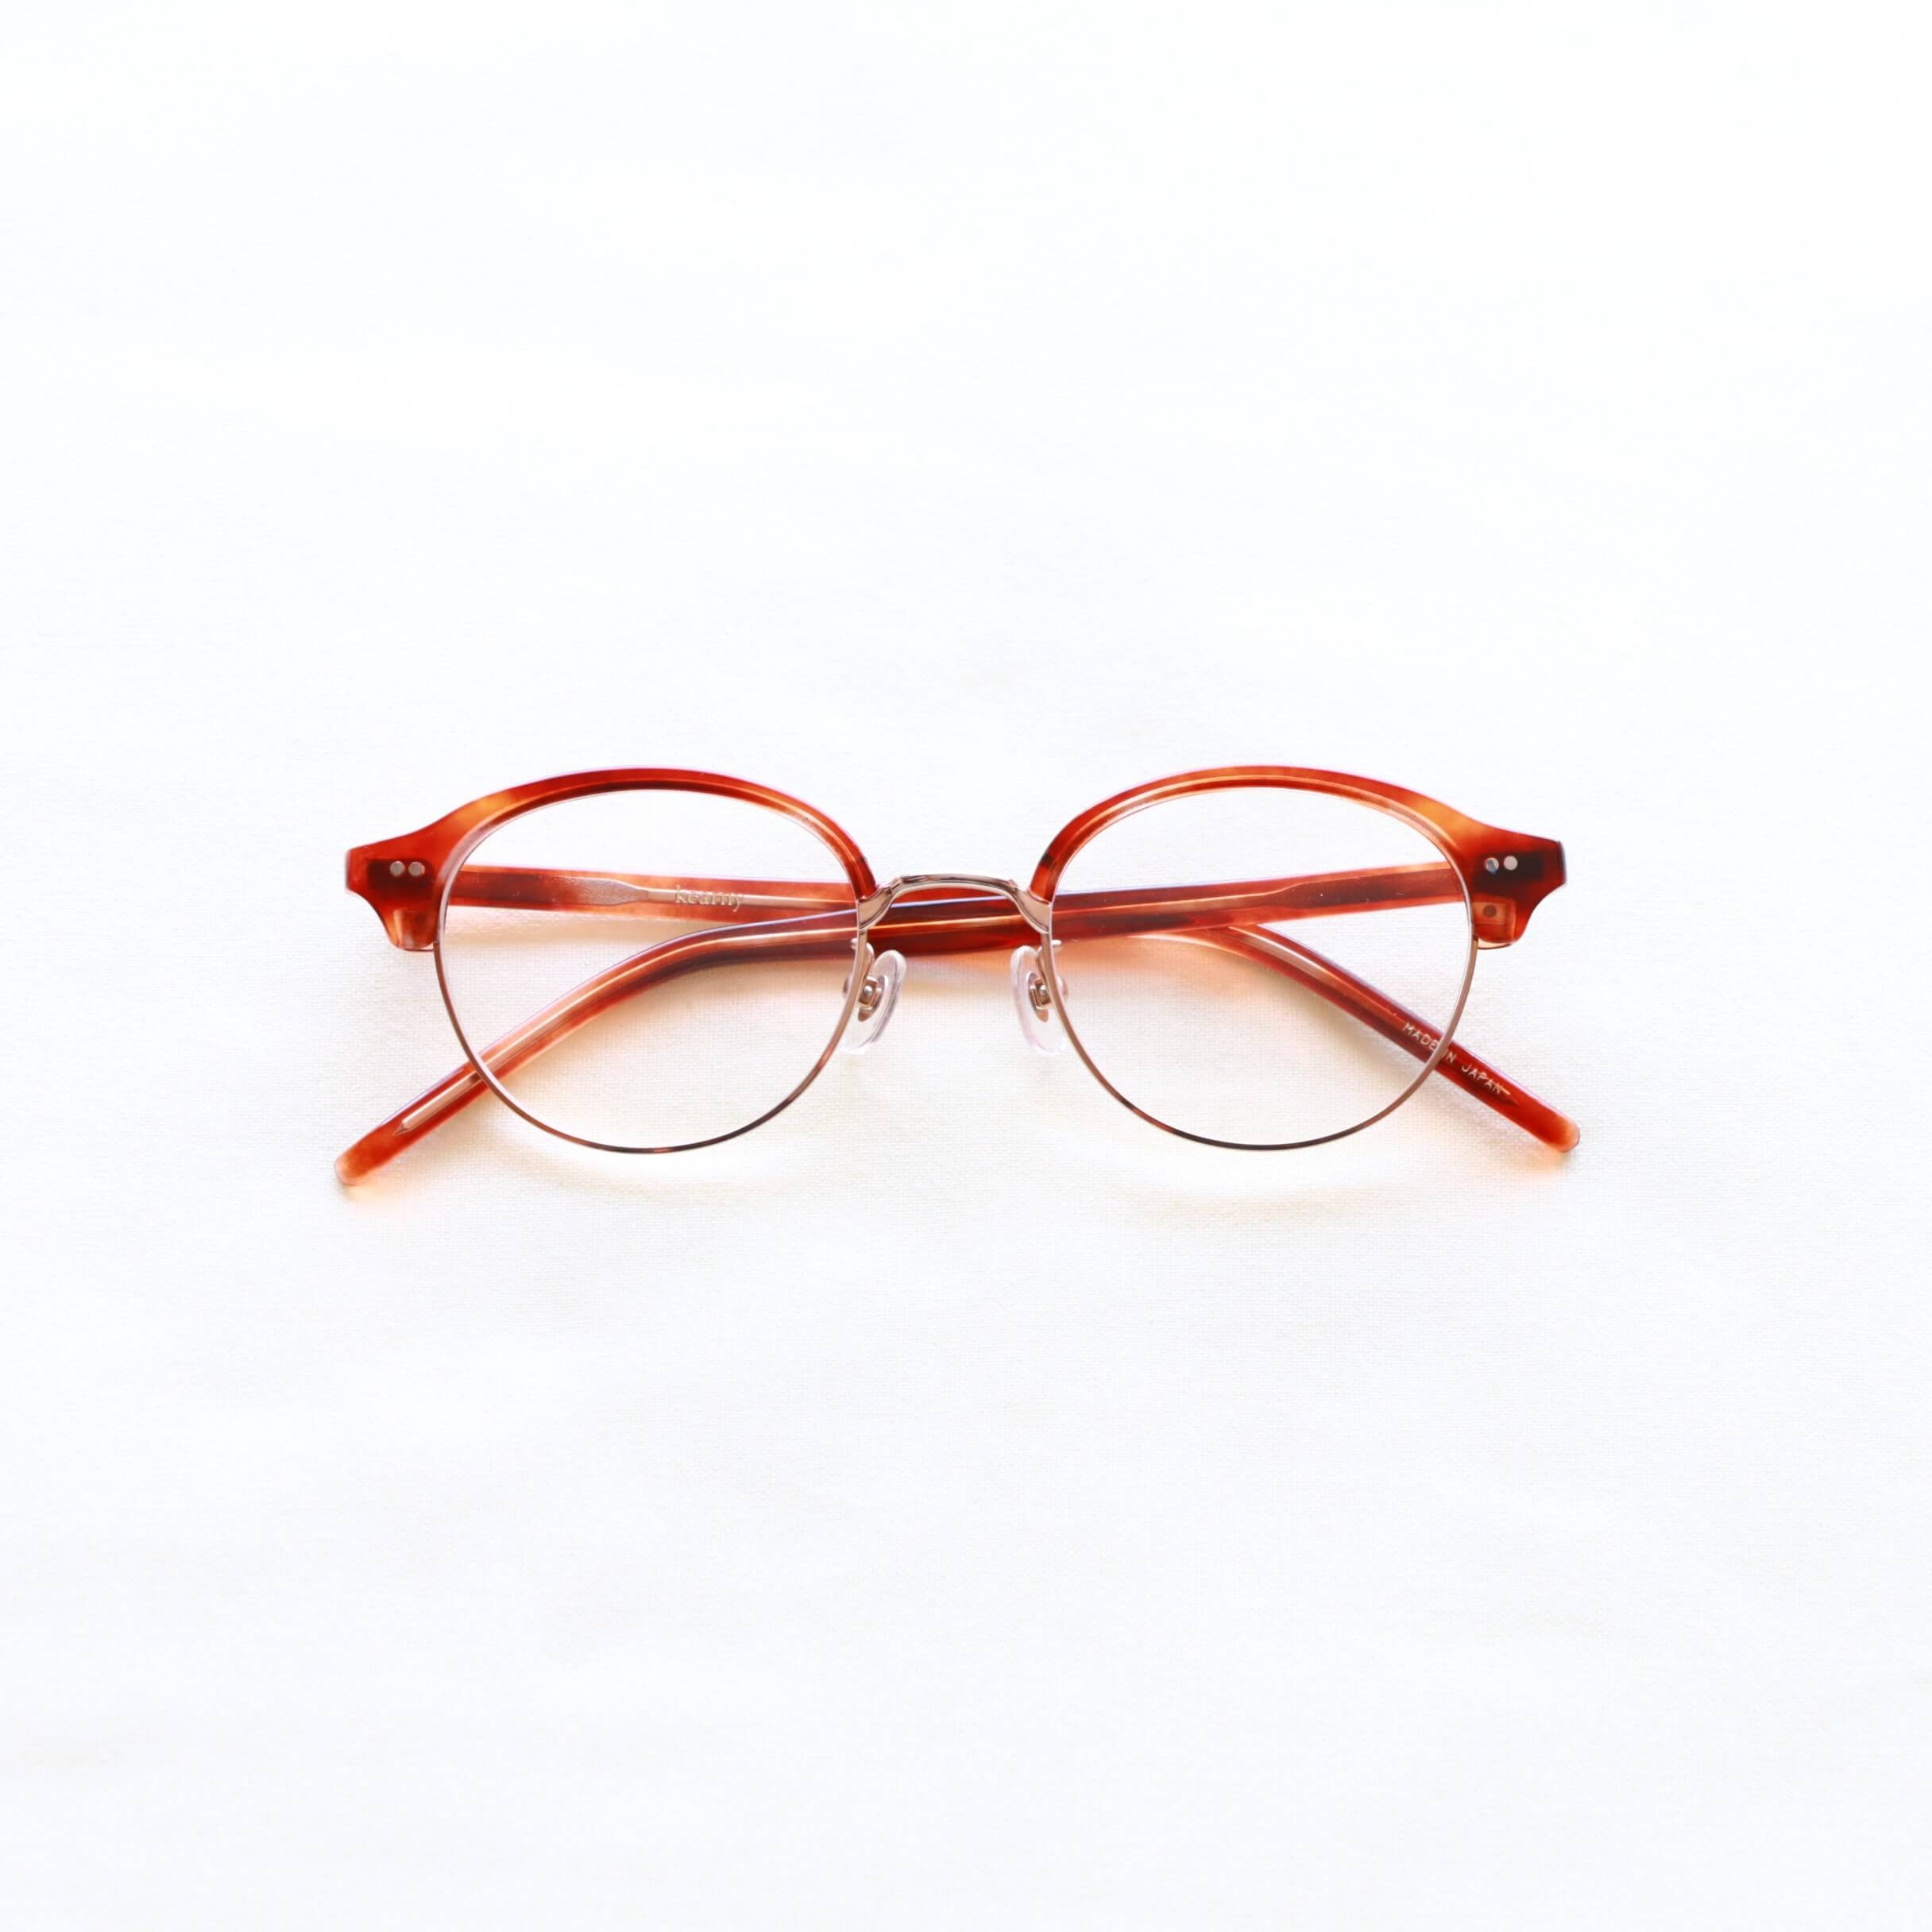 kearny カーニー sirmont brow サーモントブロー セルロイド眼鏡